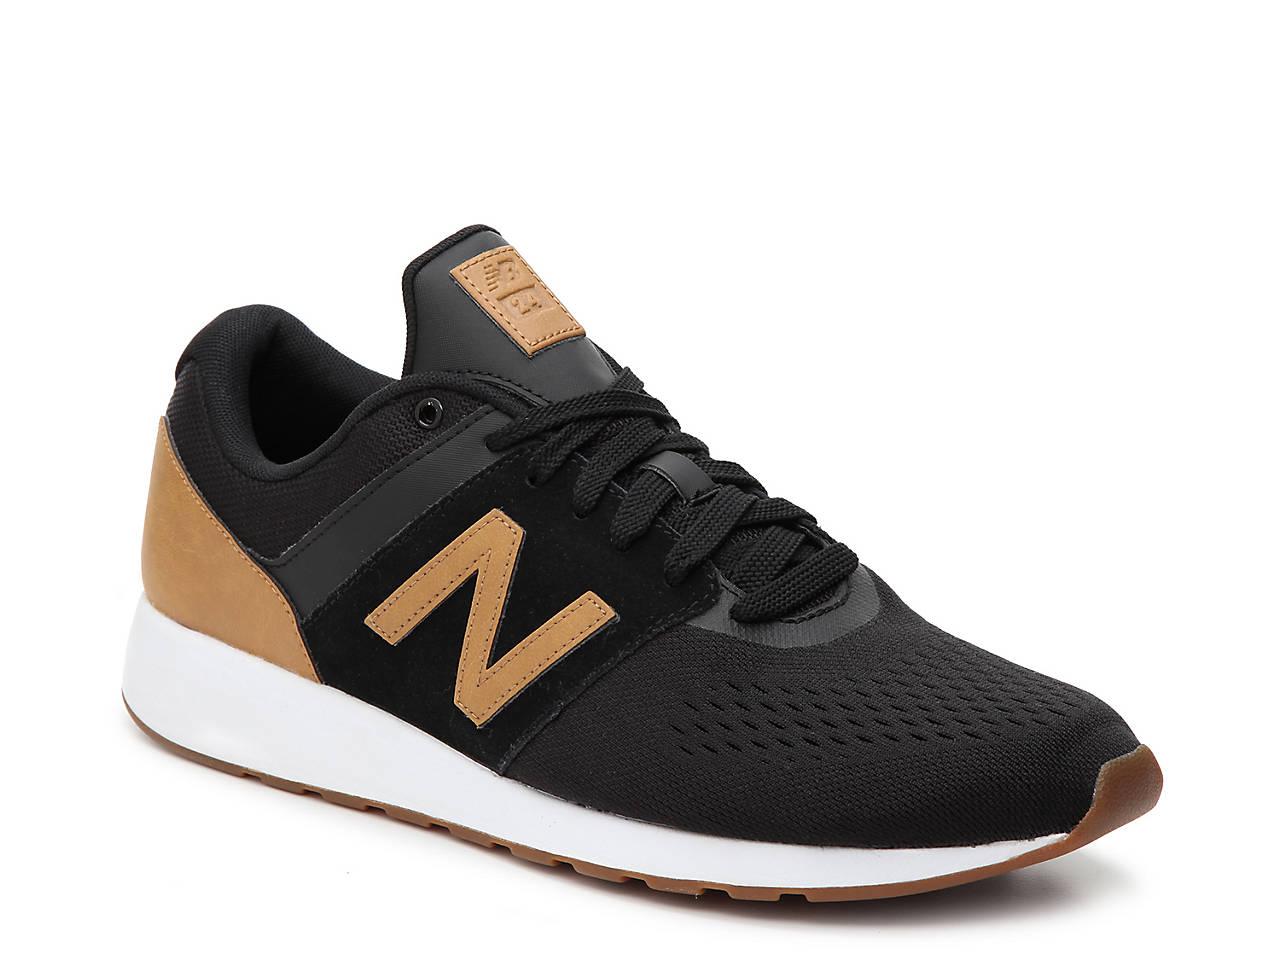 8233b9b02c140 New Balance 24 Sneaker - Men's Men's Shoes | DSW